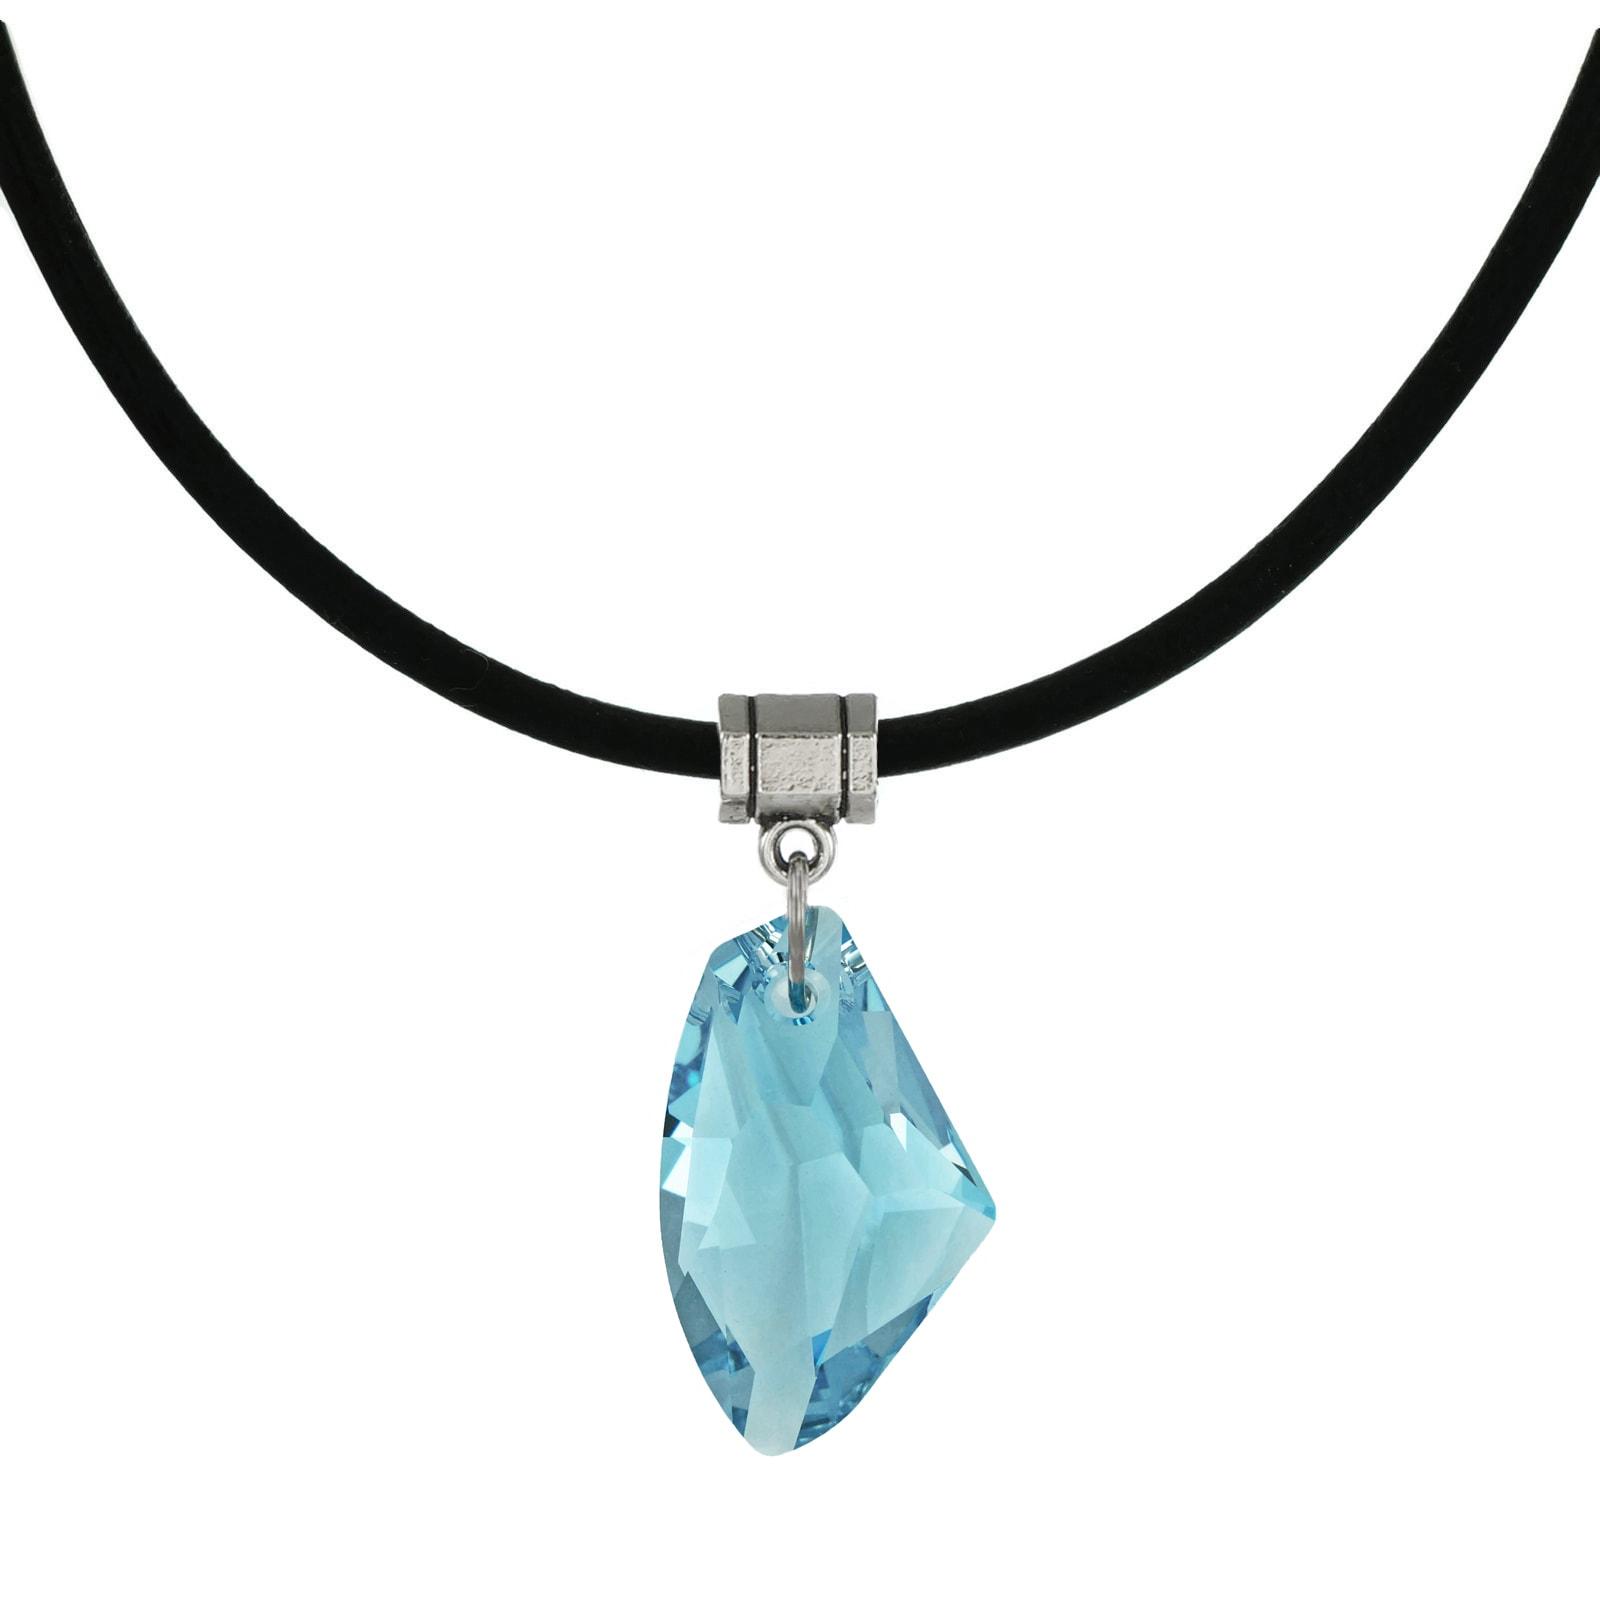 on Black Cord March Aquamarine Crystal Heart Birthstone Pewter Pendant